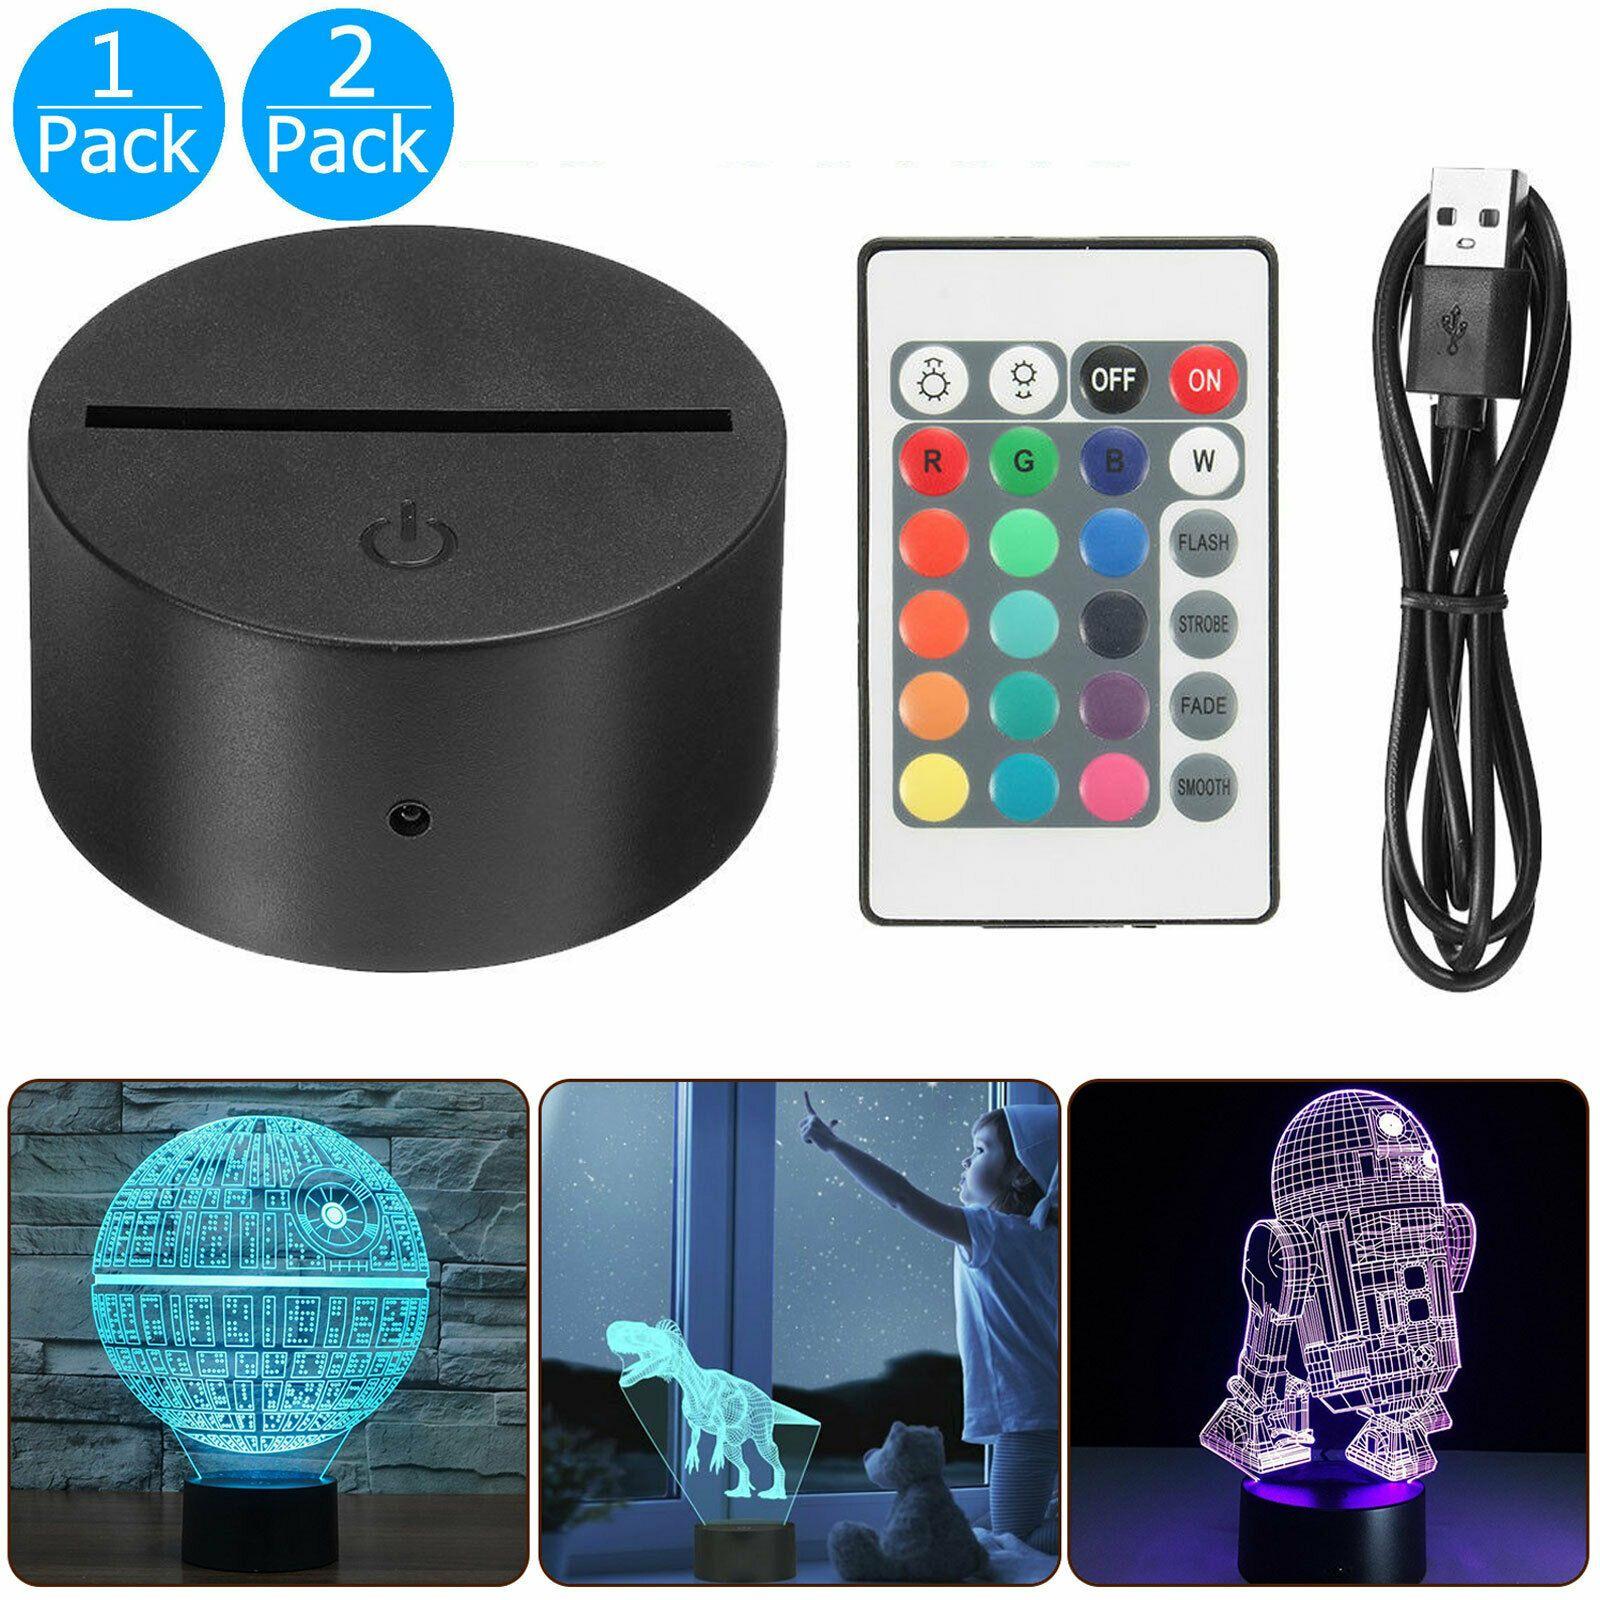 1 2 Pack Acrylic Black 3d Led Lamp Night Light Base Usb Cable Remote Control Ebay Lamp Bases Black Lamp Base 3d Night Light